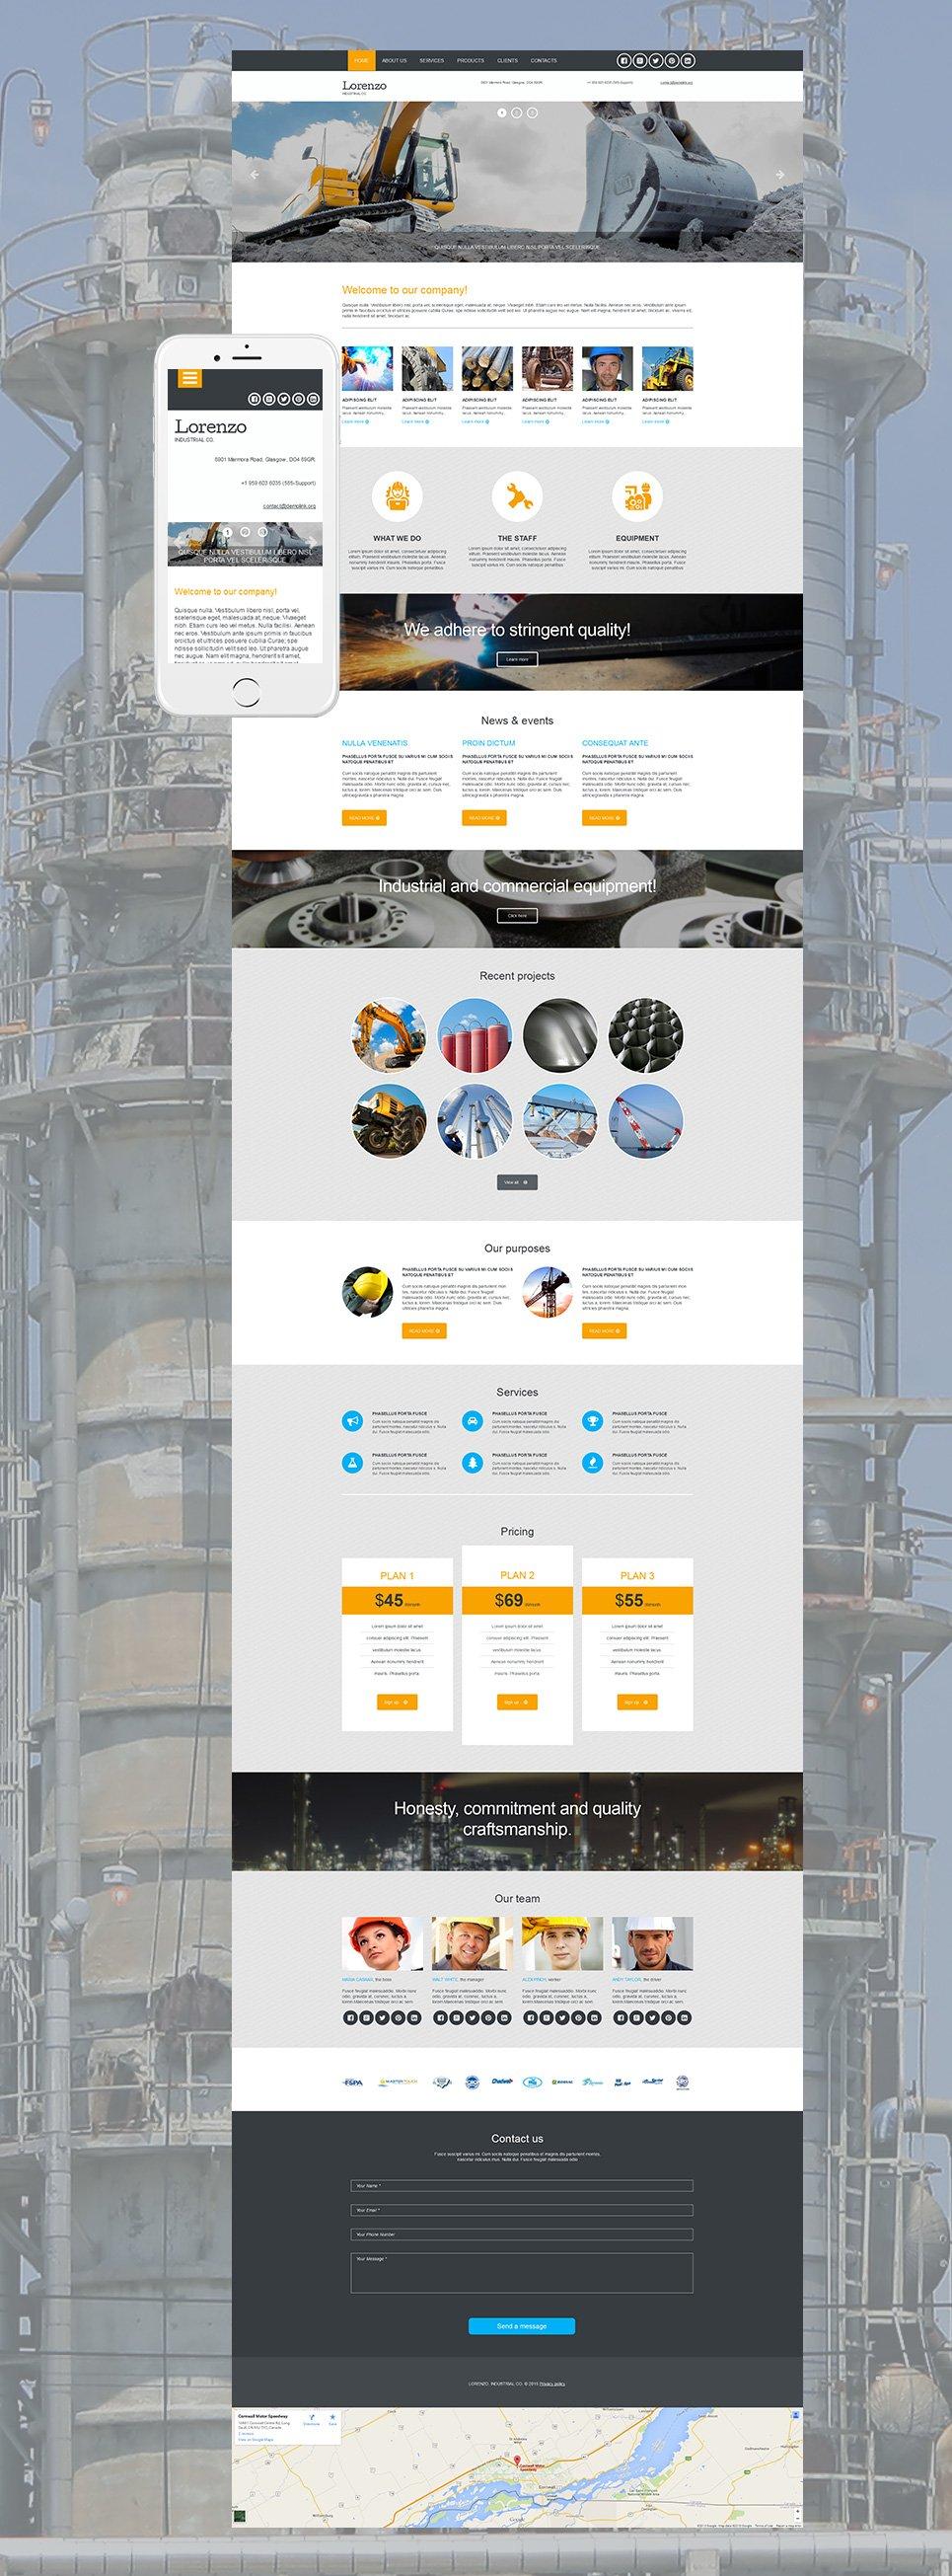 Industrial Website Design - image